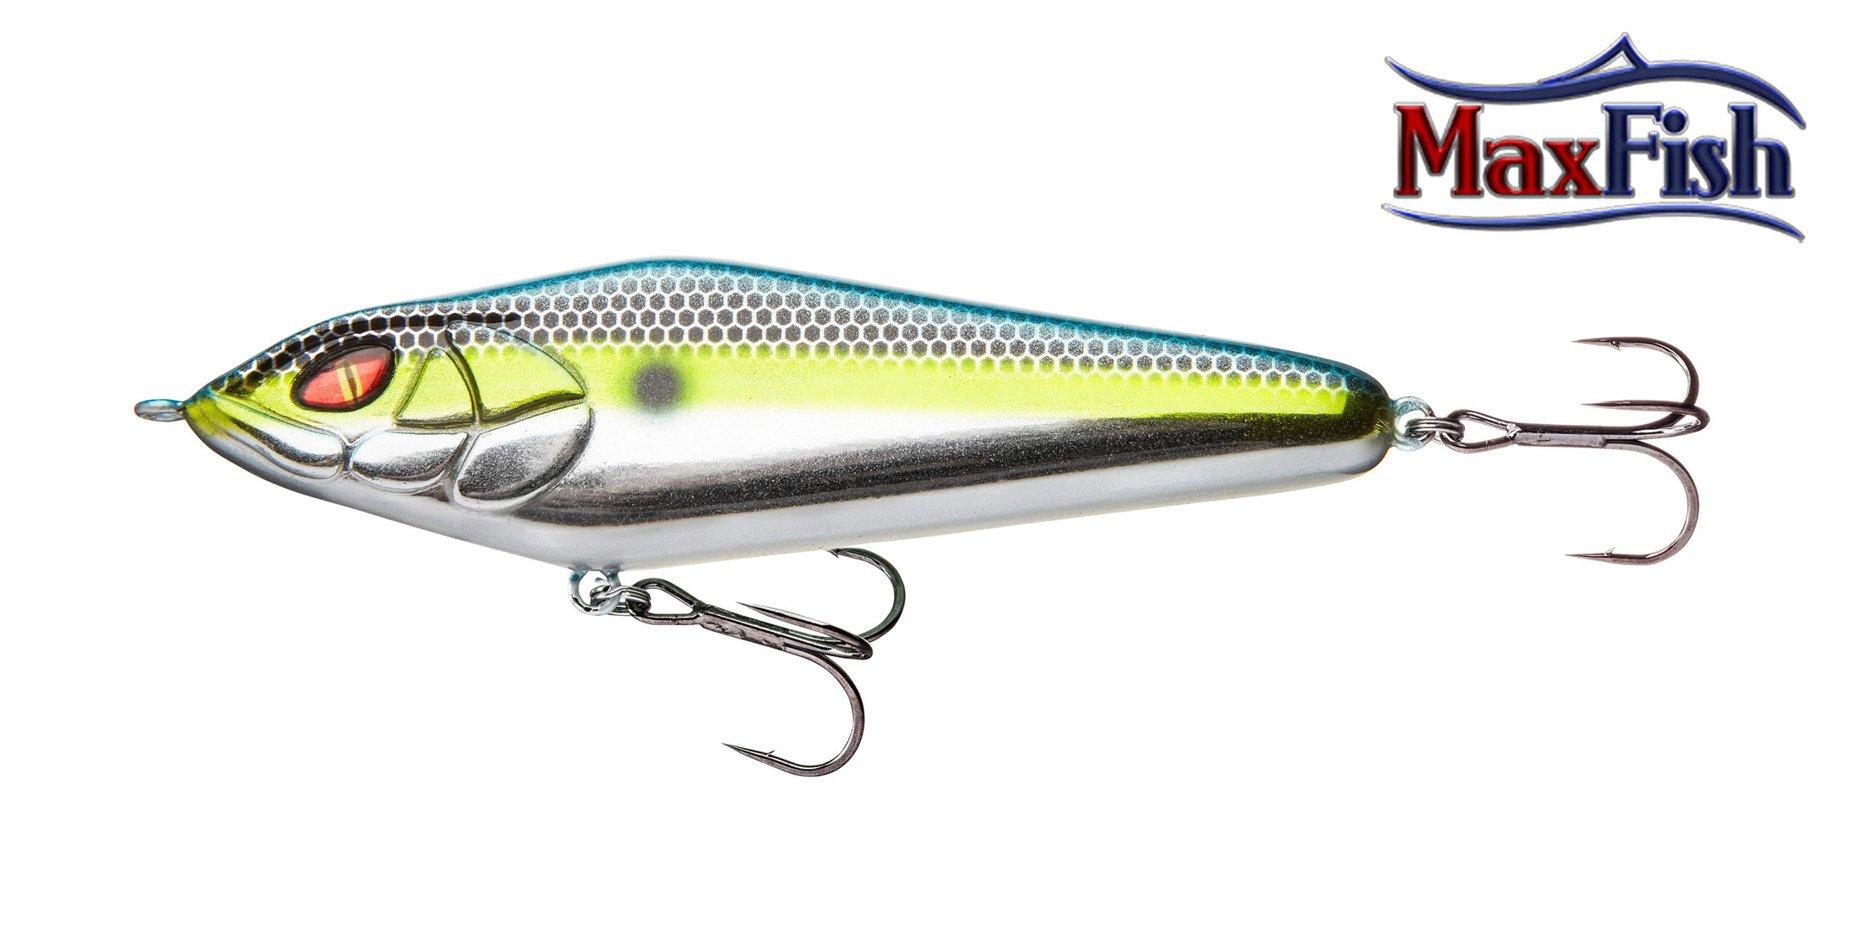 Daiwa Prorex Lazy Jerk Blue Gill Shiner - SS 15.5cm 85g